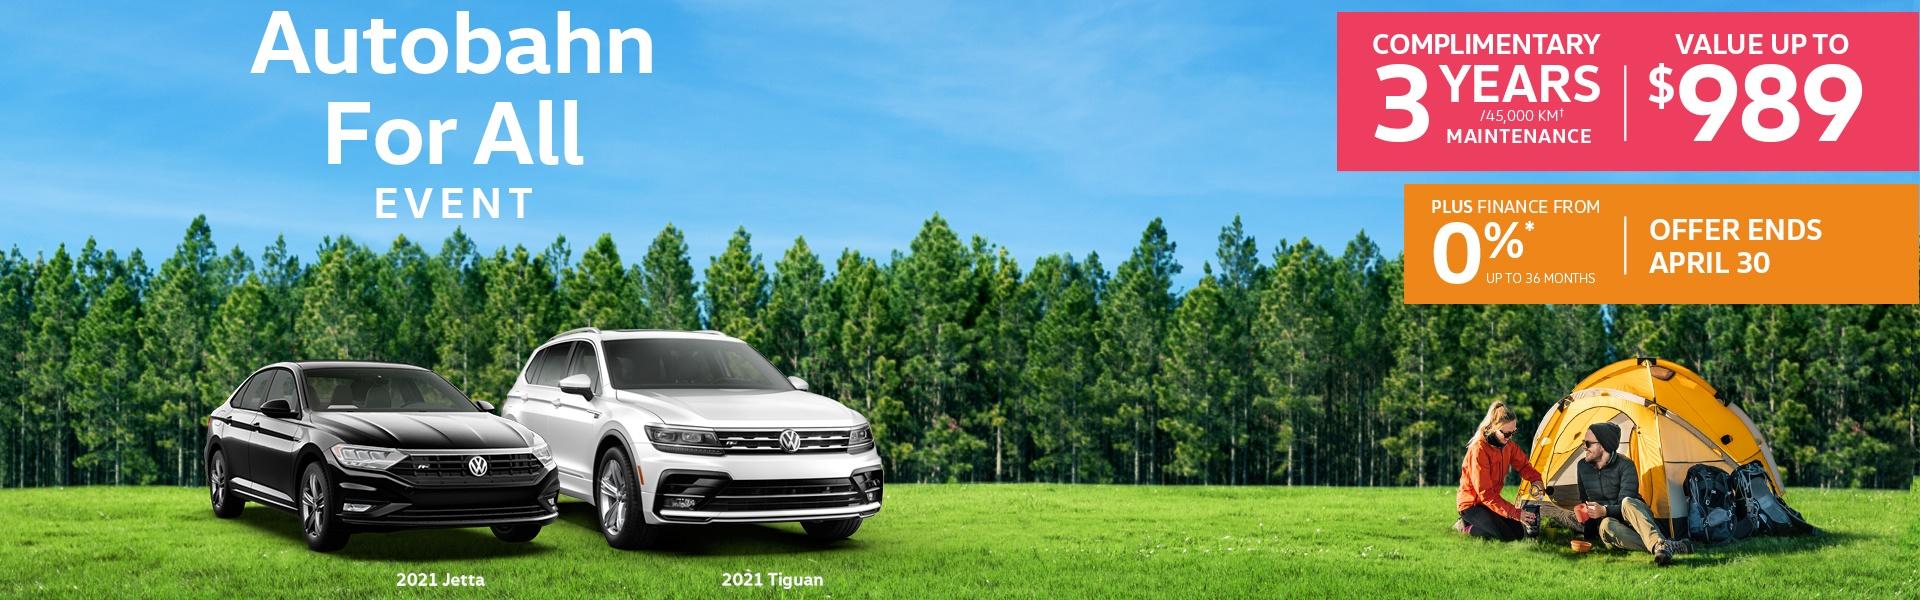 Volkswagen Autobahn